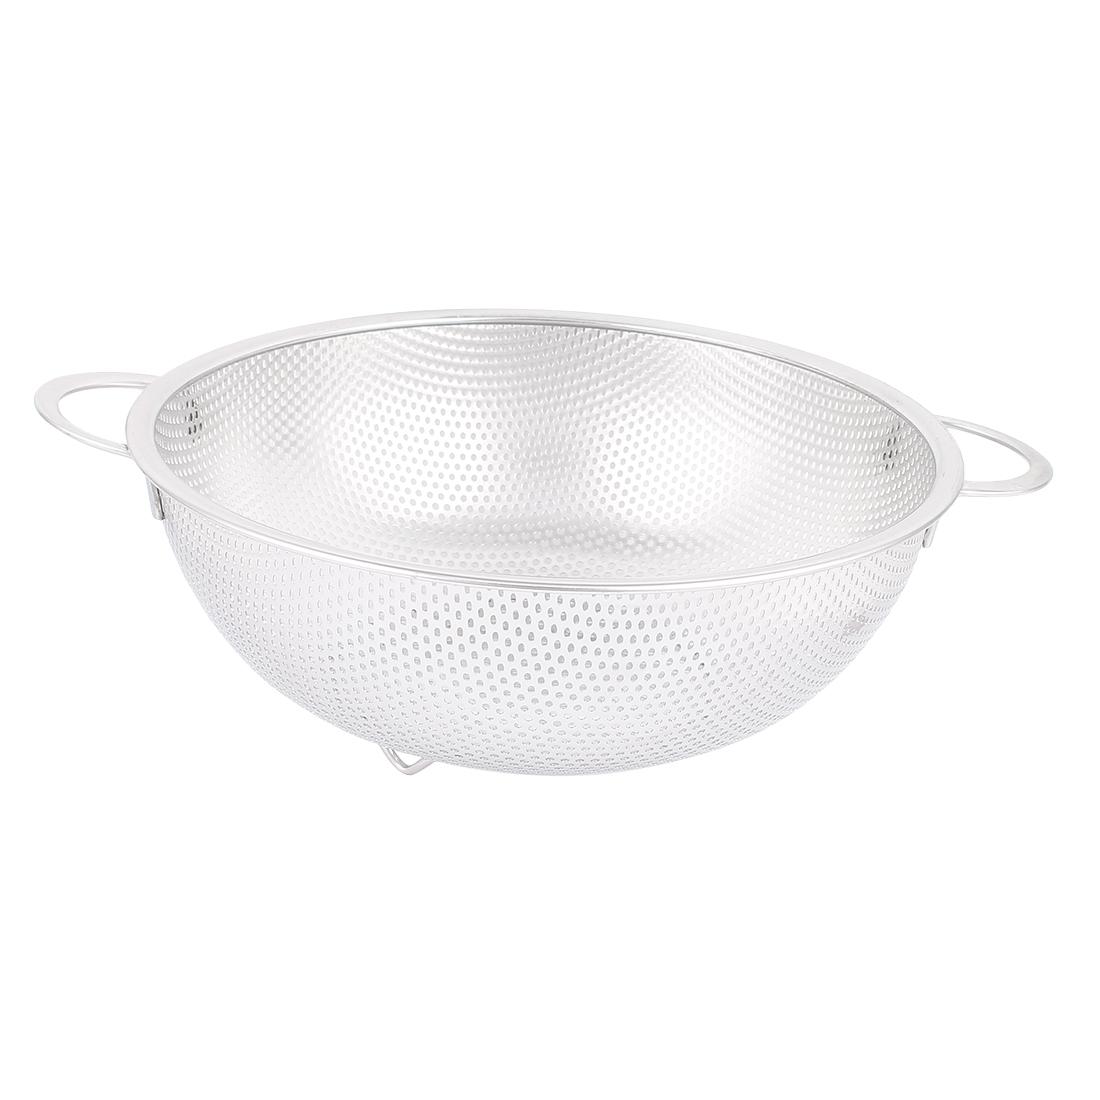 Kitchen Fruit Rice Vegetable Washing Metal Mesh Drainer Strainer Colander 10''